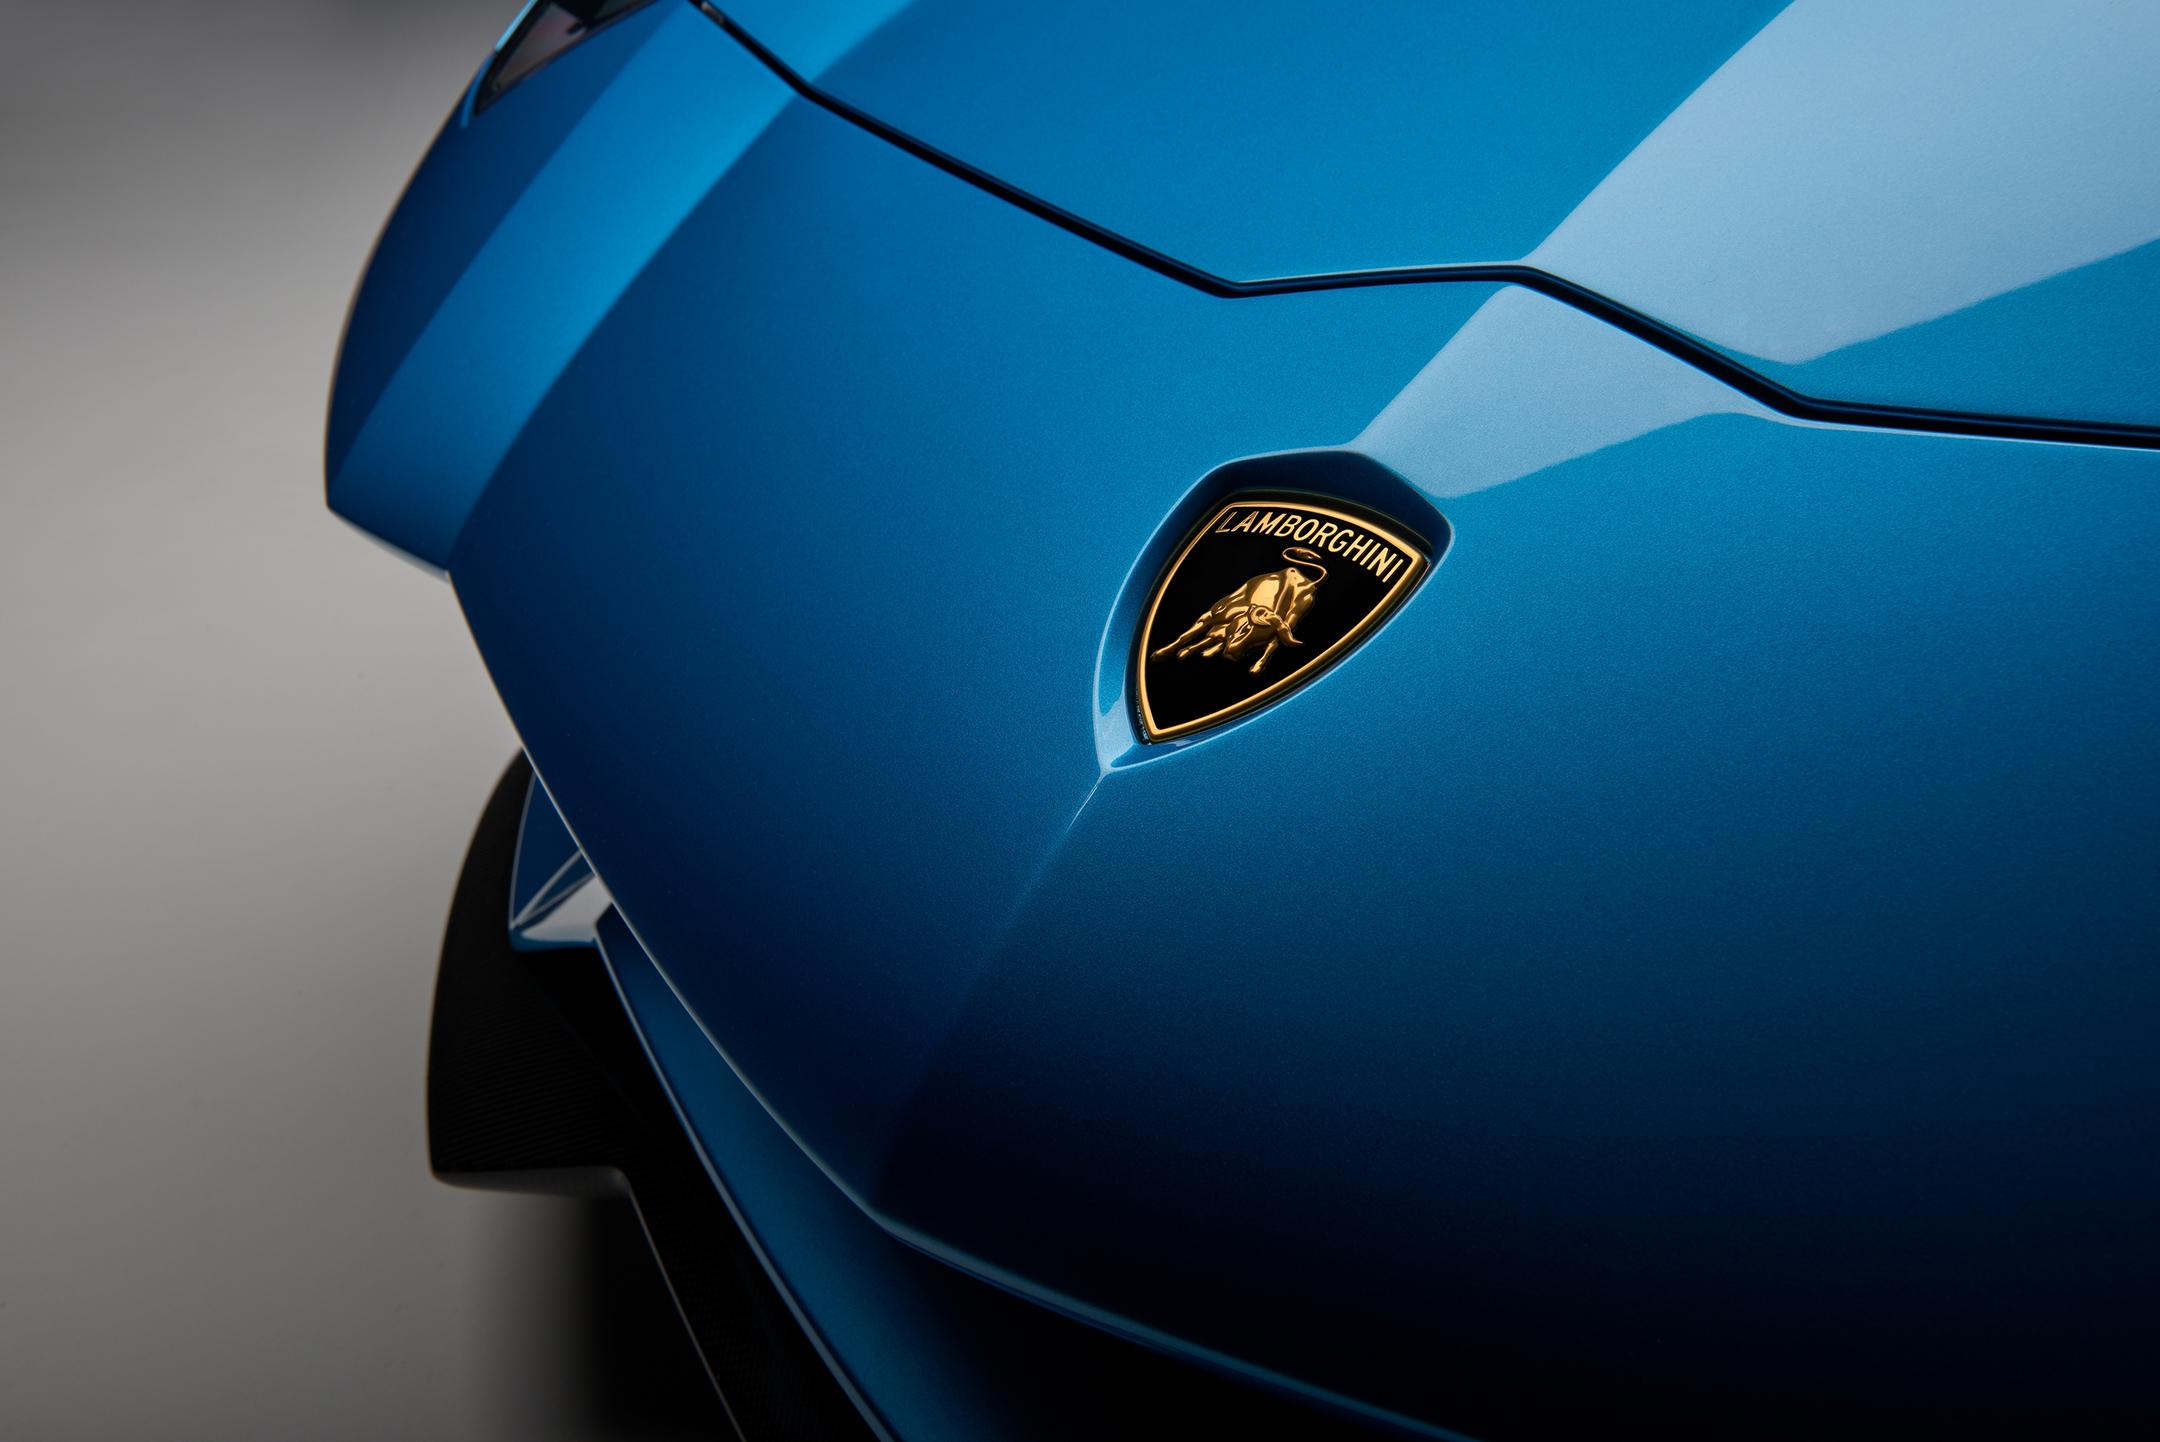 Lamborghini Aventador S Roadster - 2017 - front logo